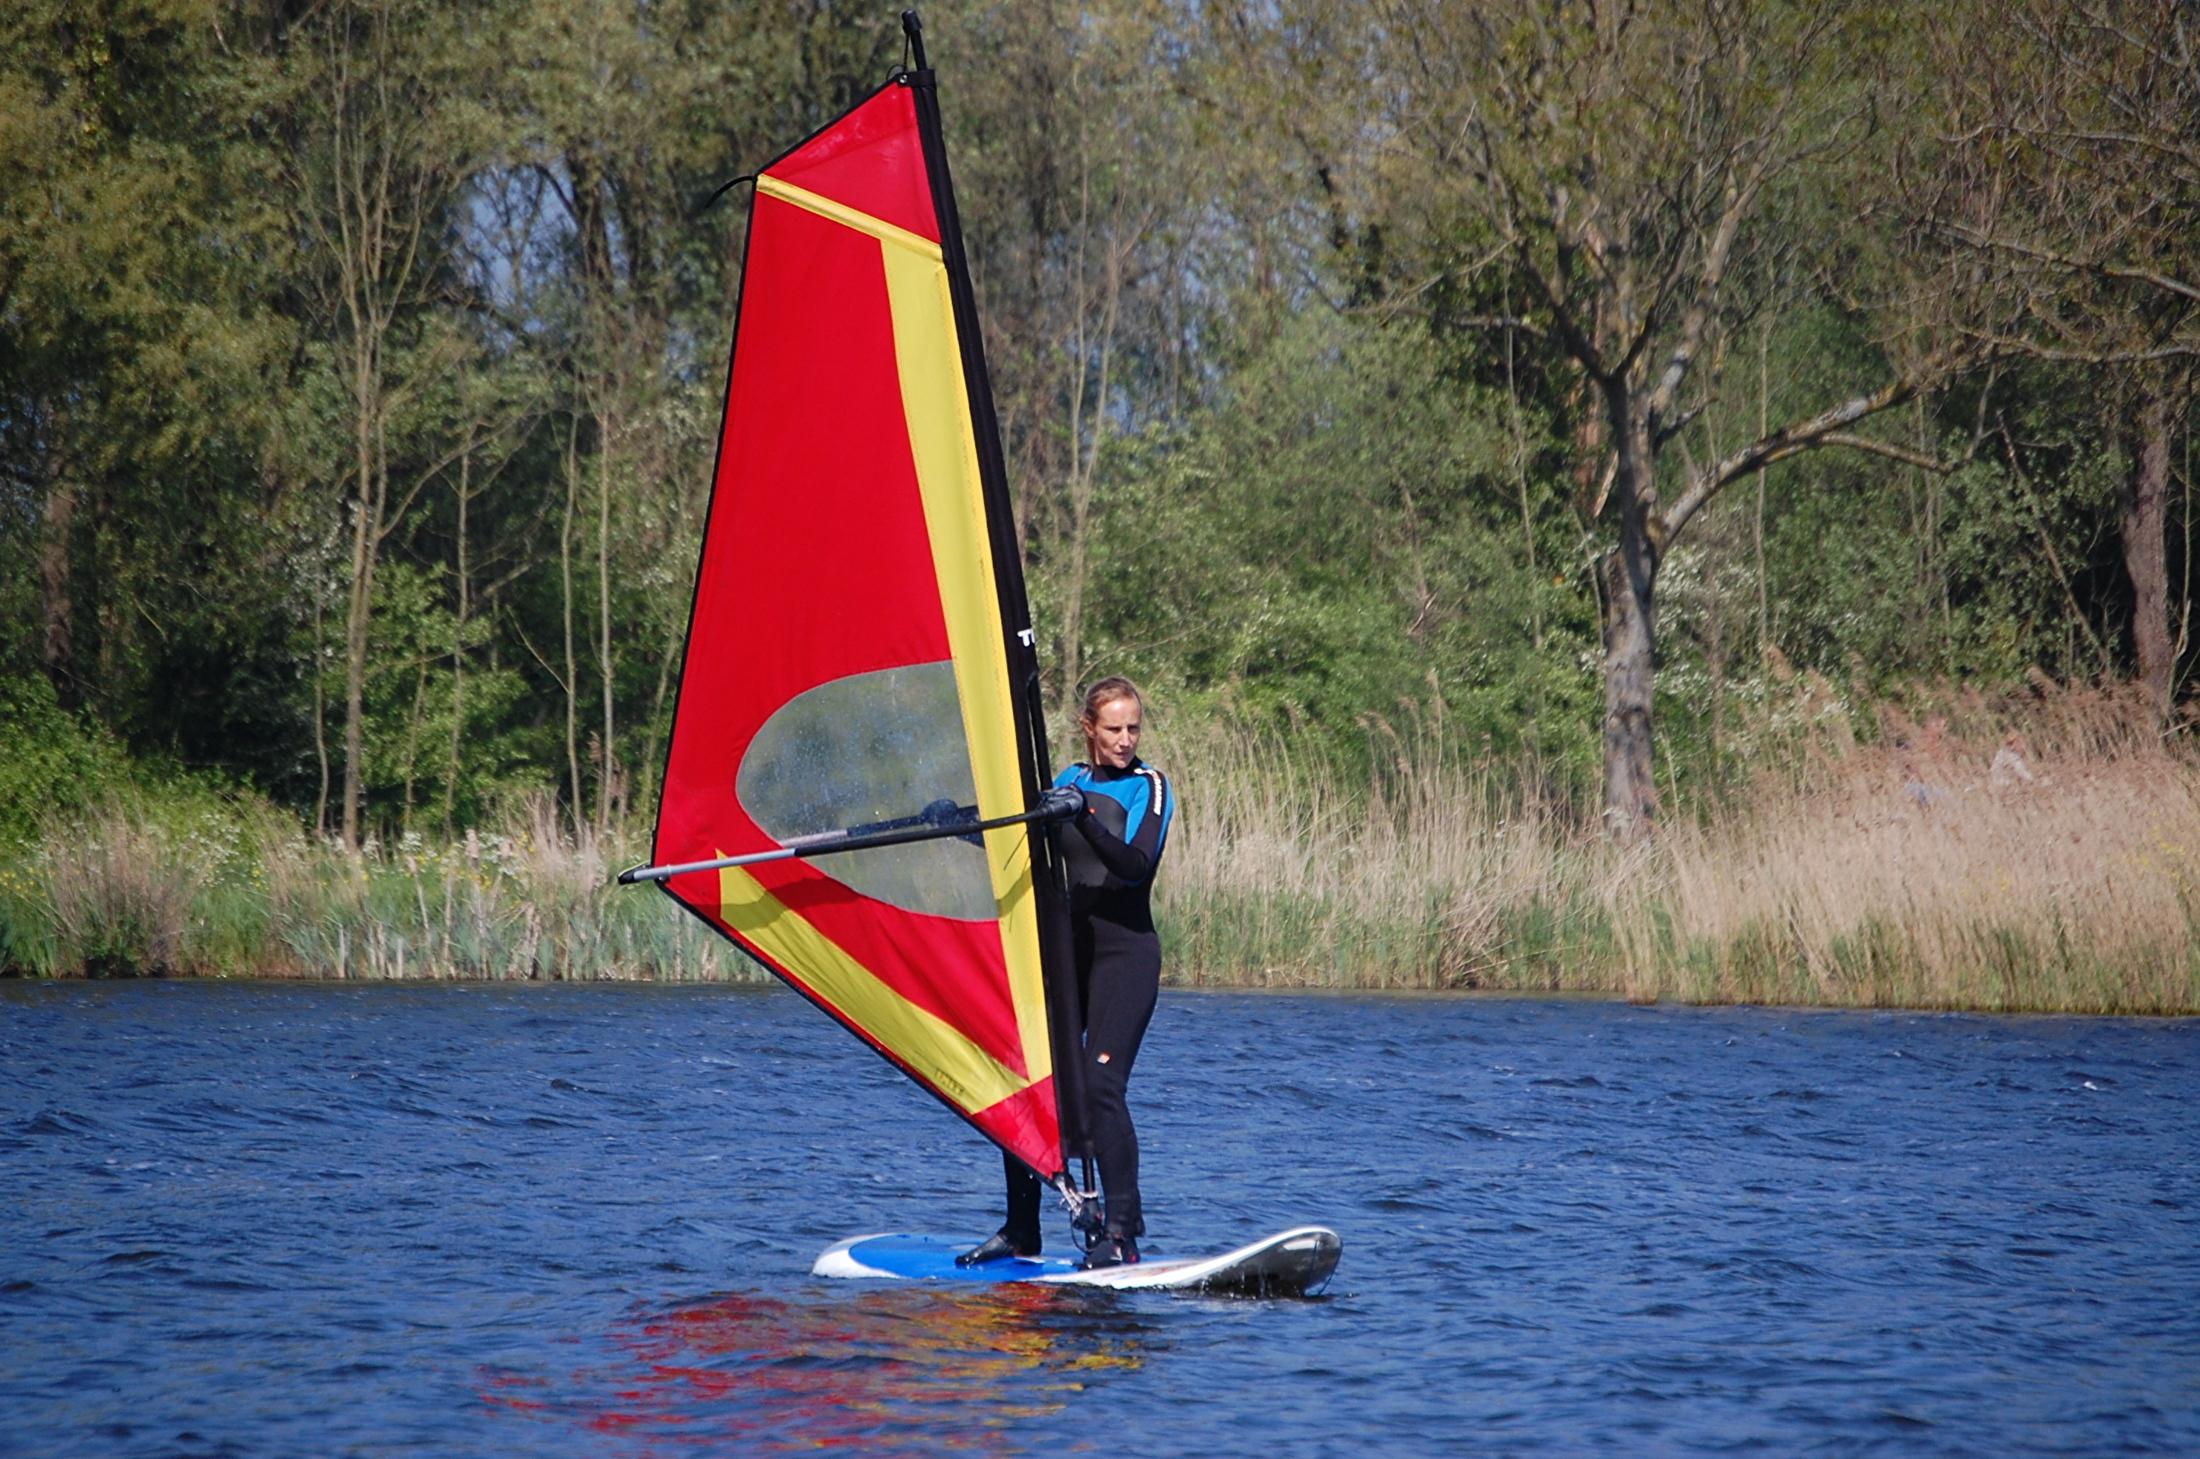 Privéles windsurfen